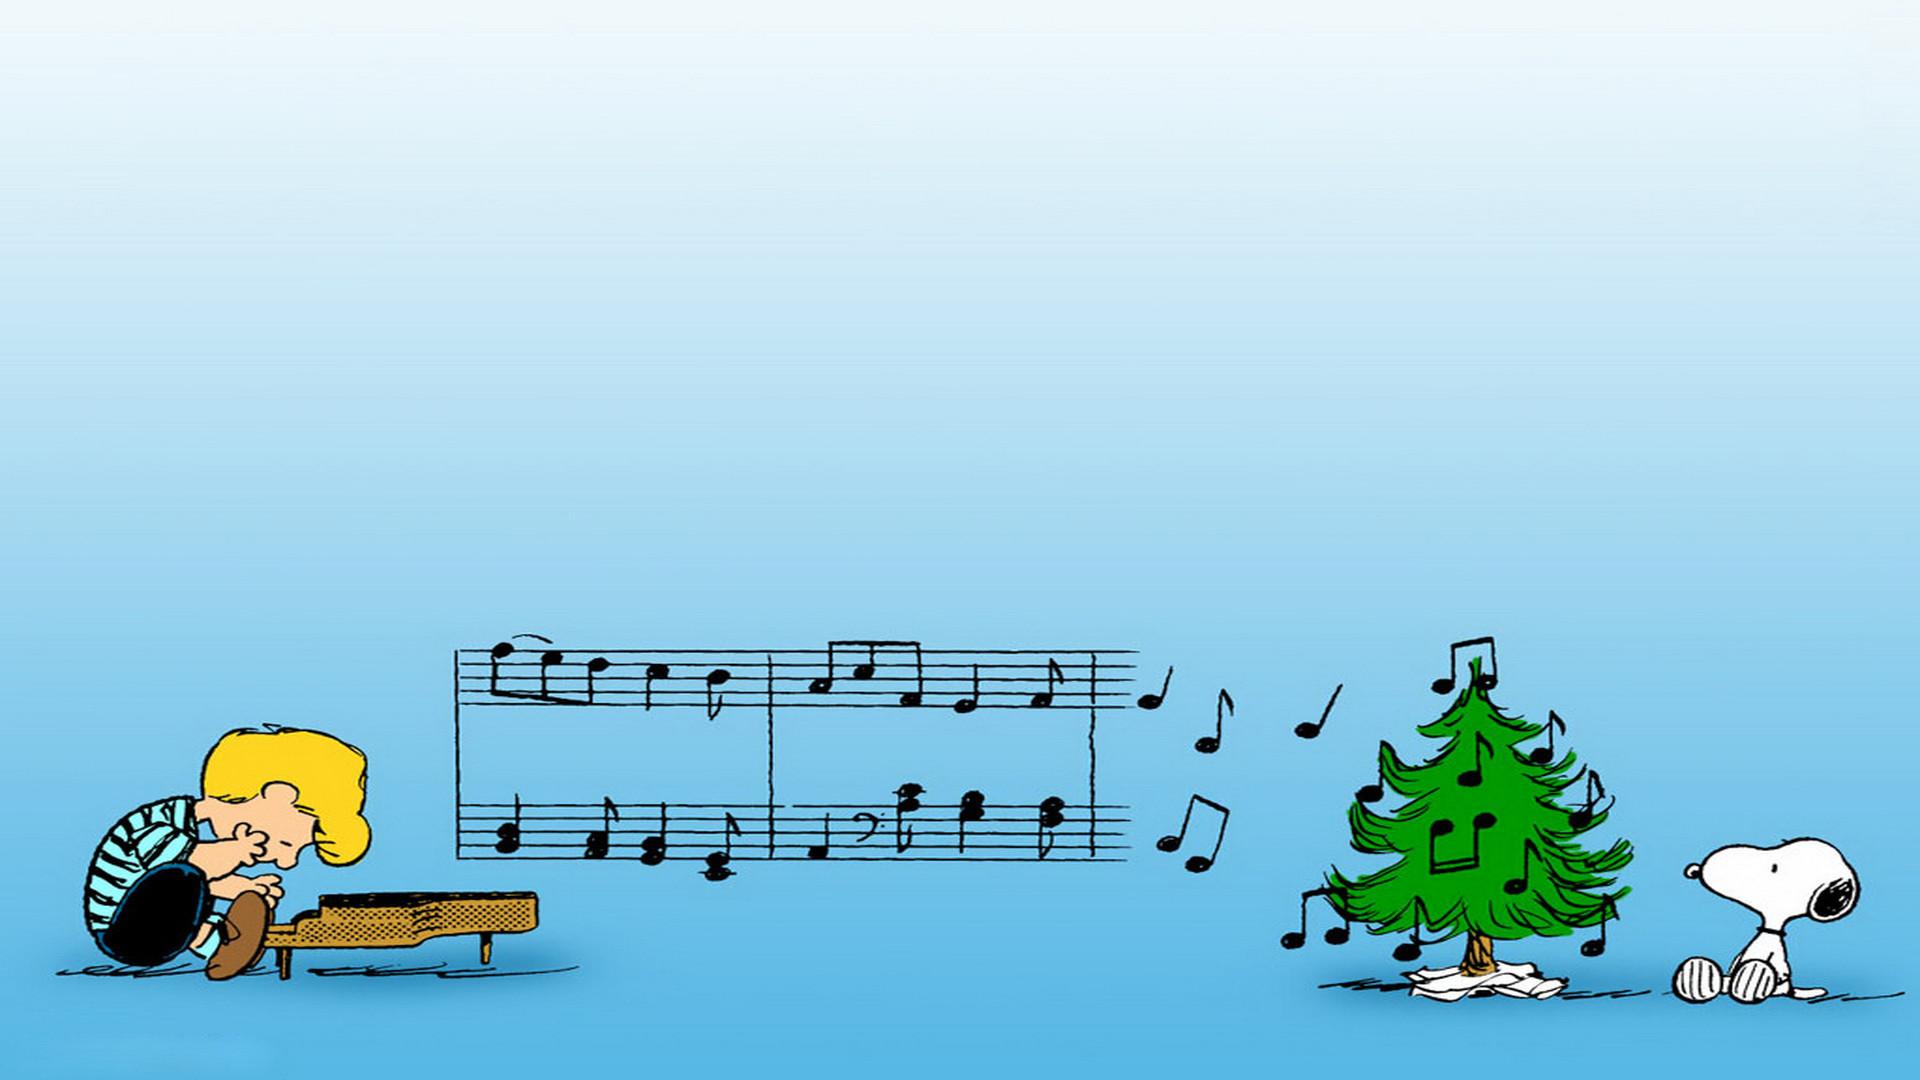 Peanuts Fall Desktop Wallpaper Snoopy Christmas Backgrounds 183 ① Wallpapertag